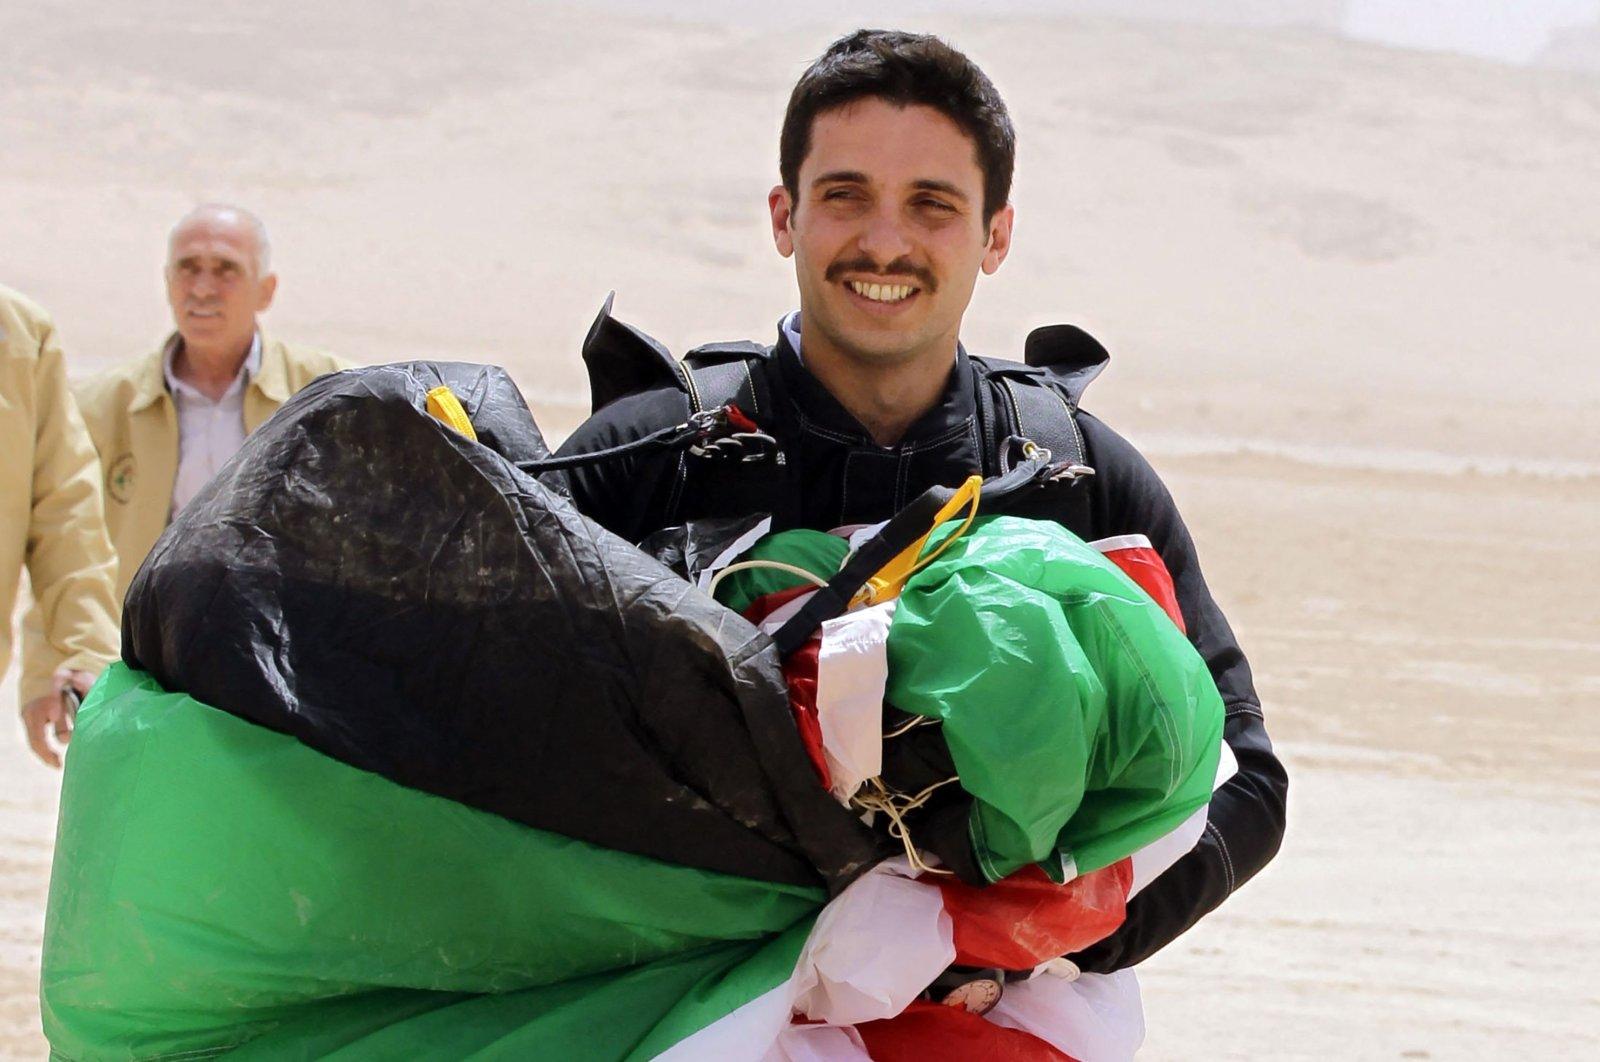 "Jordanian Prince Hamzah bin Hussein, president of the Royal Aero Sports Club of Jordan, carries a parachute during a media event to announce the launch of ""Skydive Jordan"", in the Wadi Rum desert, Jordan, April 17, 2012. (AFP Photo)"